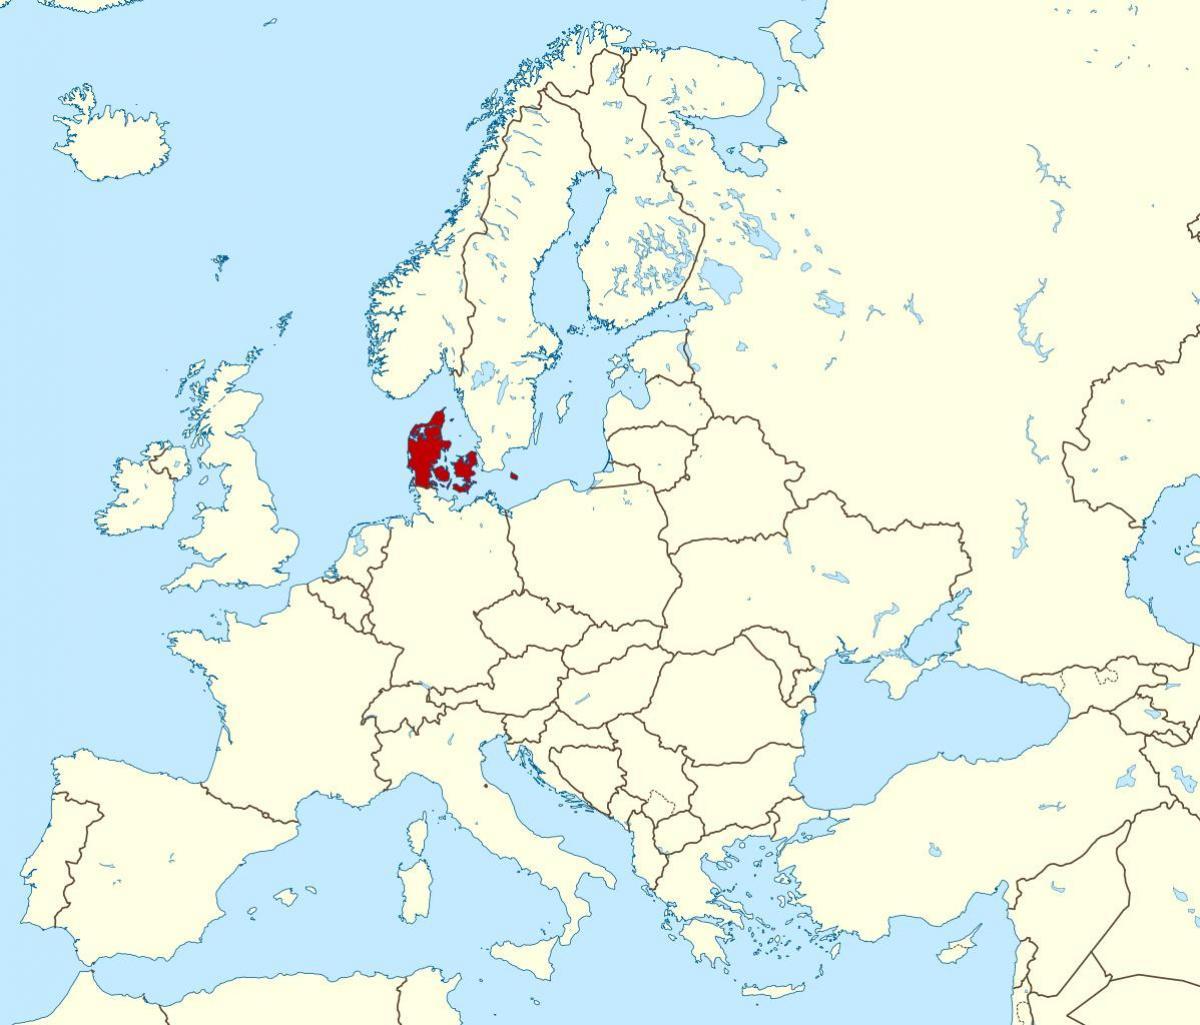 Denmark On Map Of World.Denmark On World Map World Map Showing Denmark Northern Europe